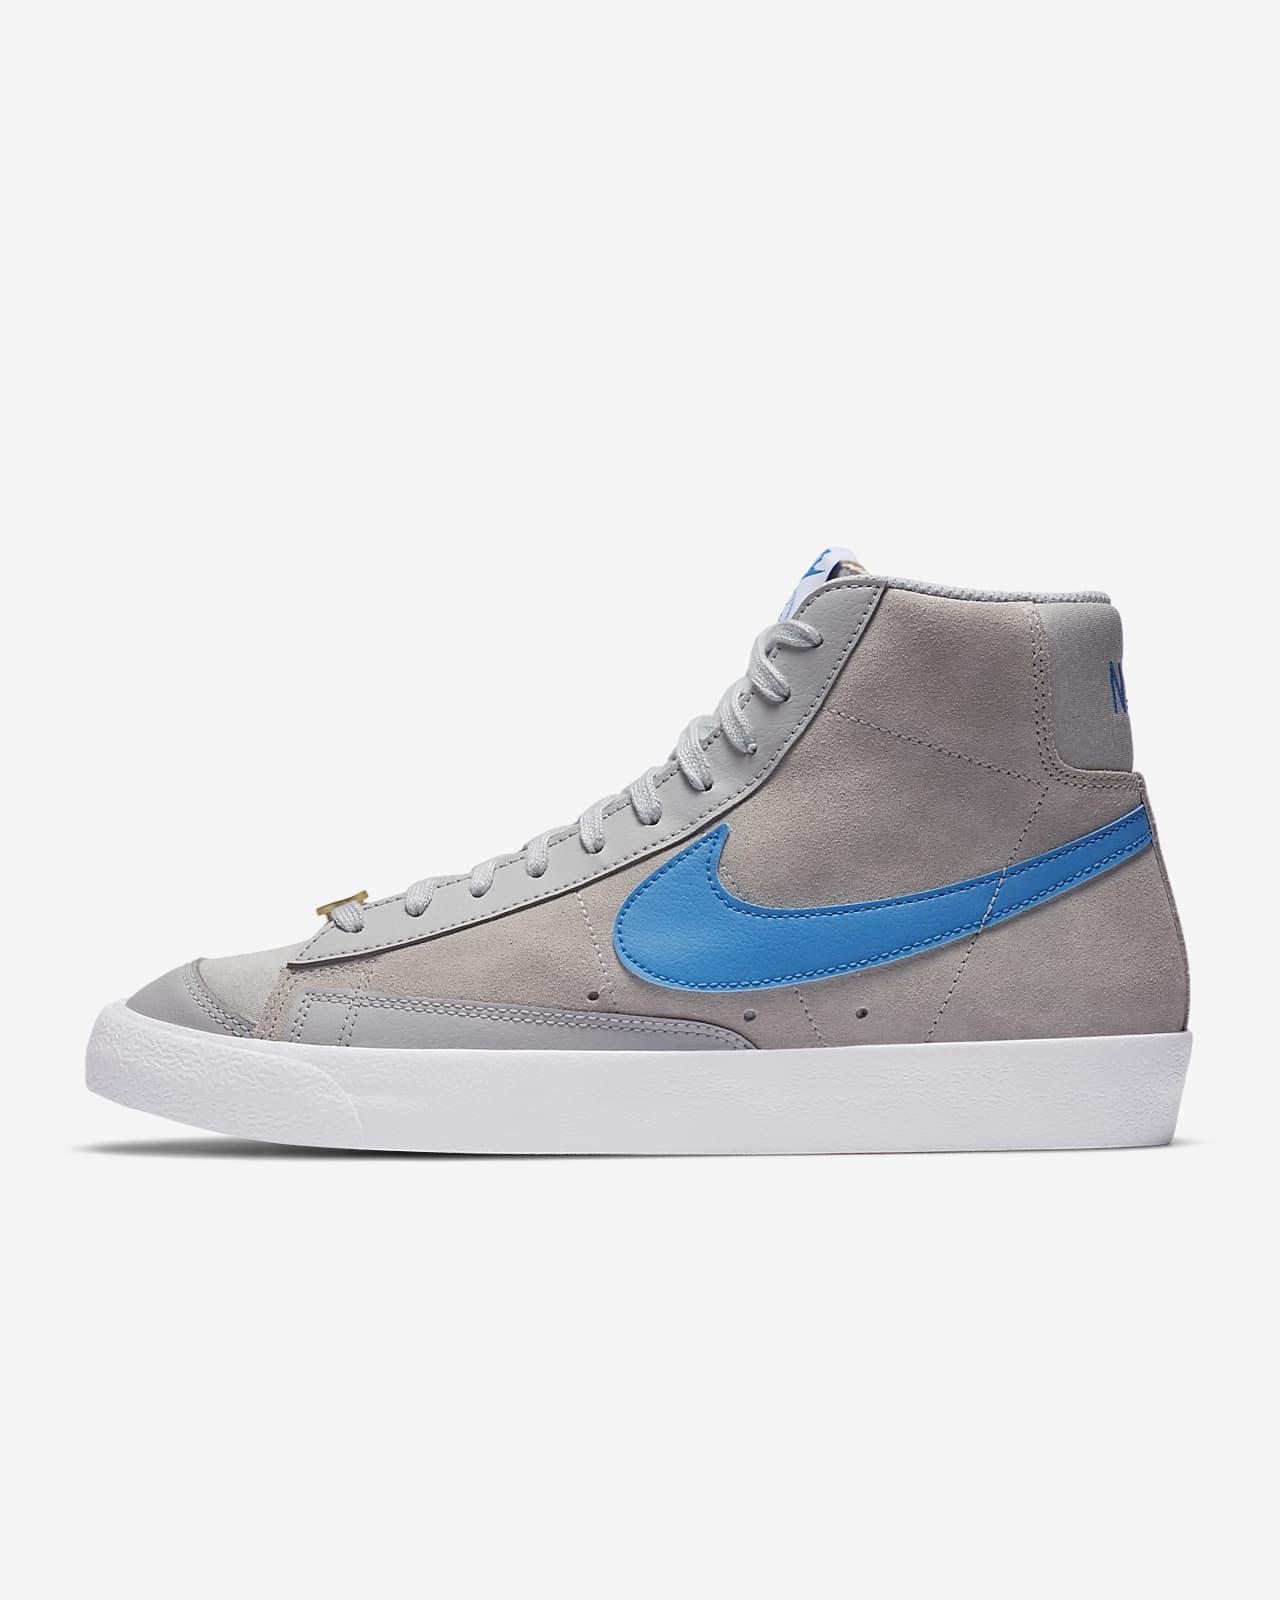 Nike Blazer 中筒 '77 NRG 男鞋